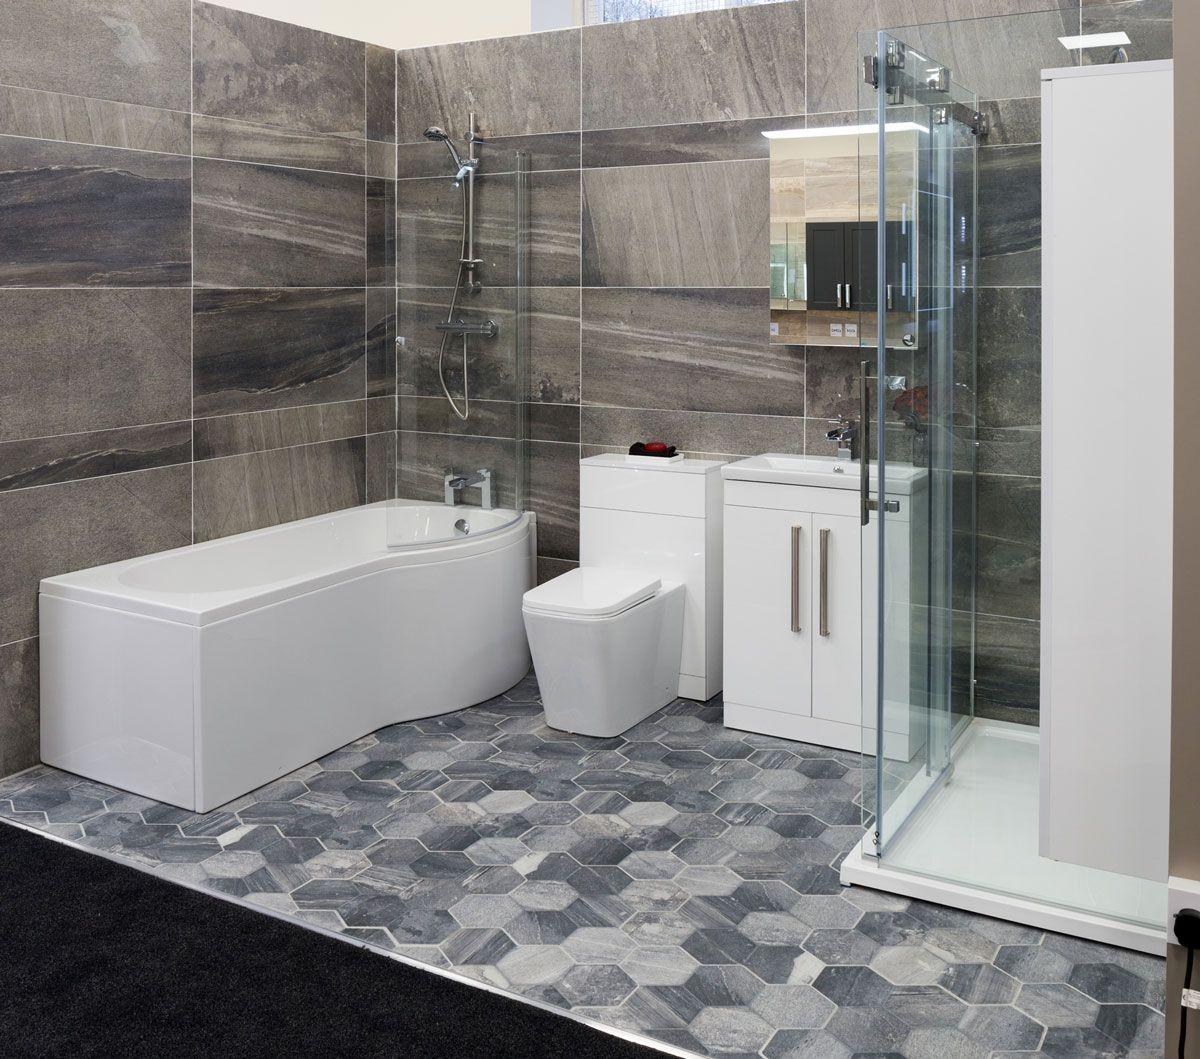 Model keramik kamar mandi minimalis modern model keramik kamar mandi - Kamar Mandi Hotel Dengan Keramik Kamar Mandi Bermotif Hexagonal Dan Dinding Batu Alam